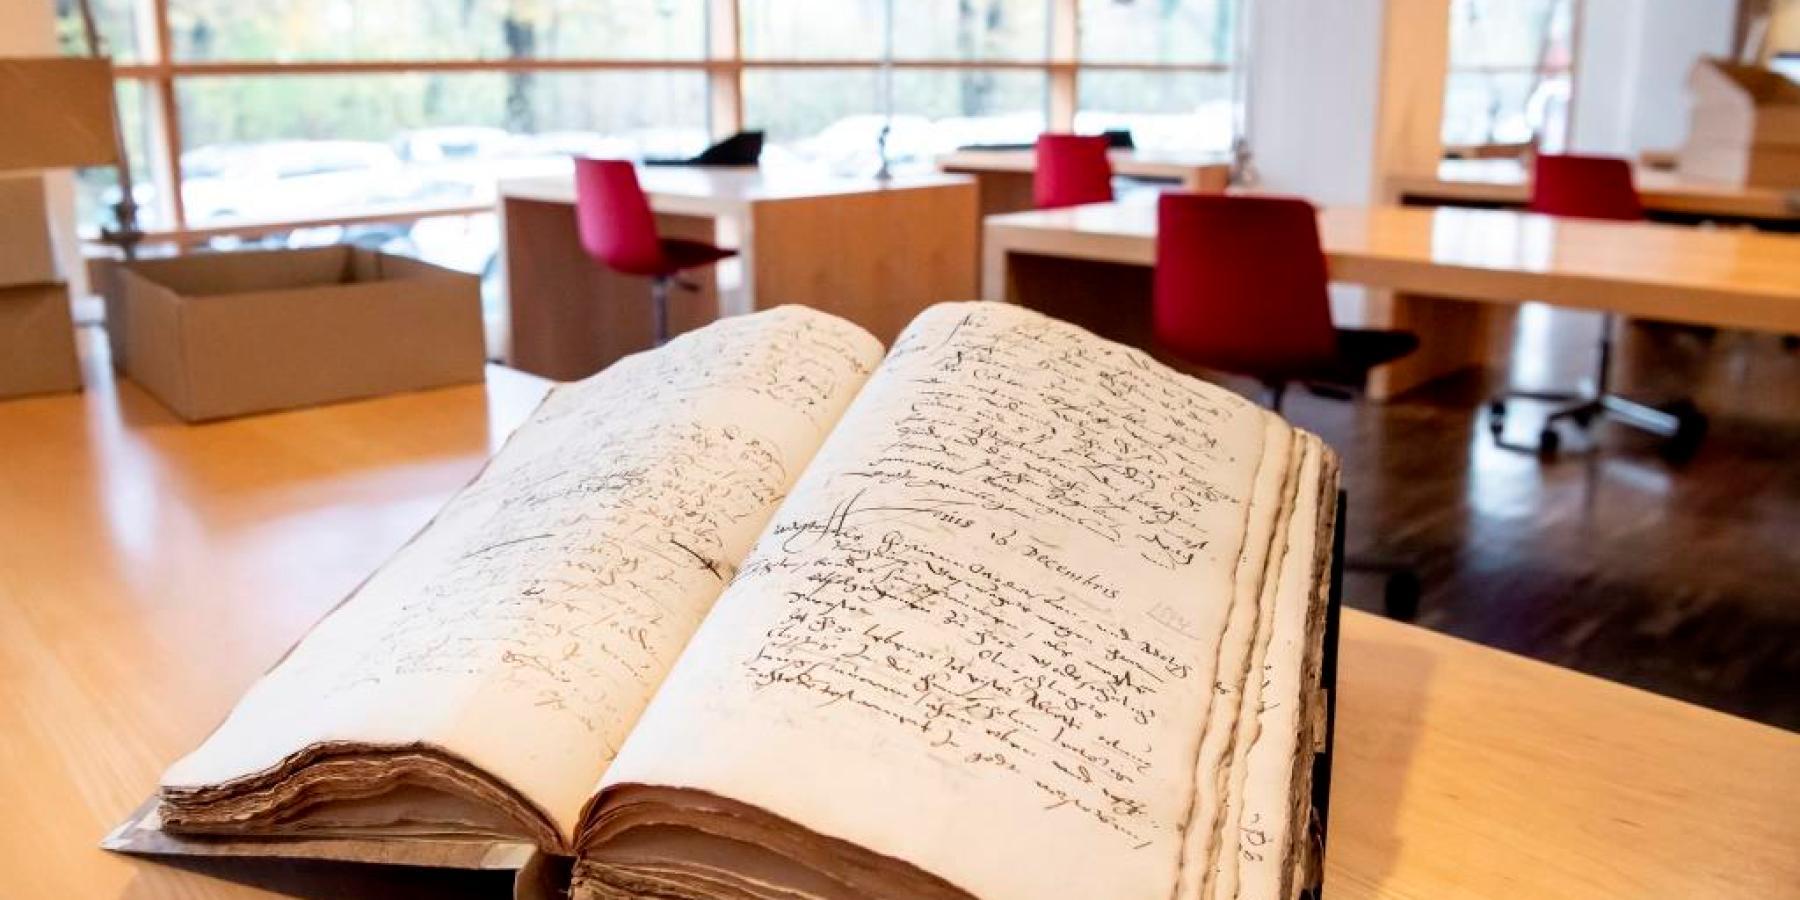 Lesesaal im Stadtarchiv öffnet